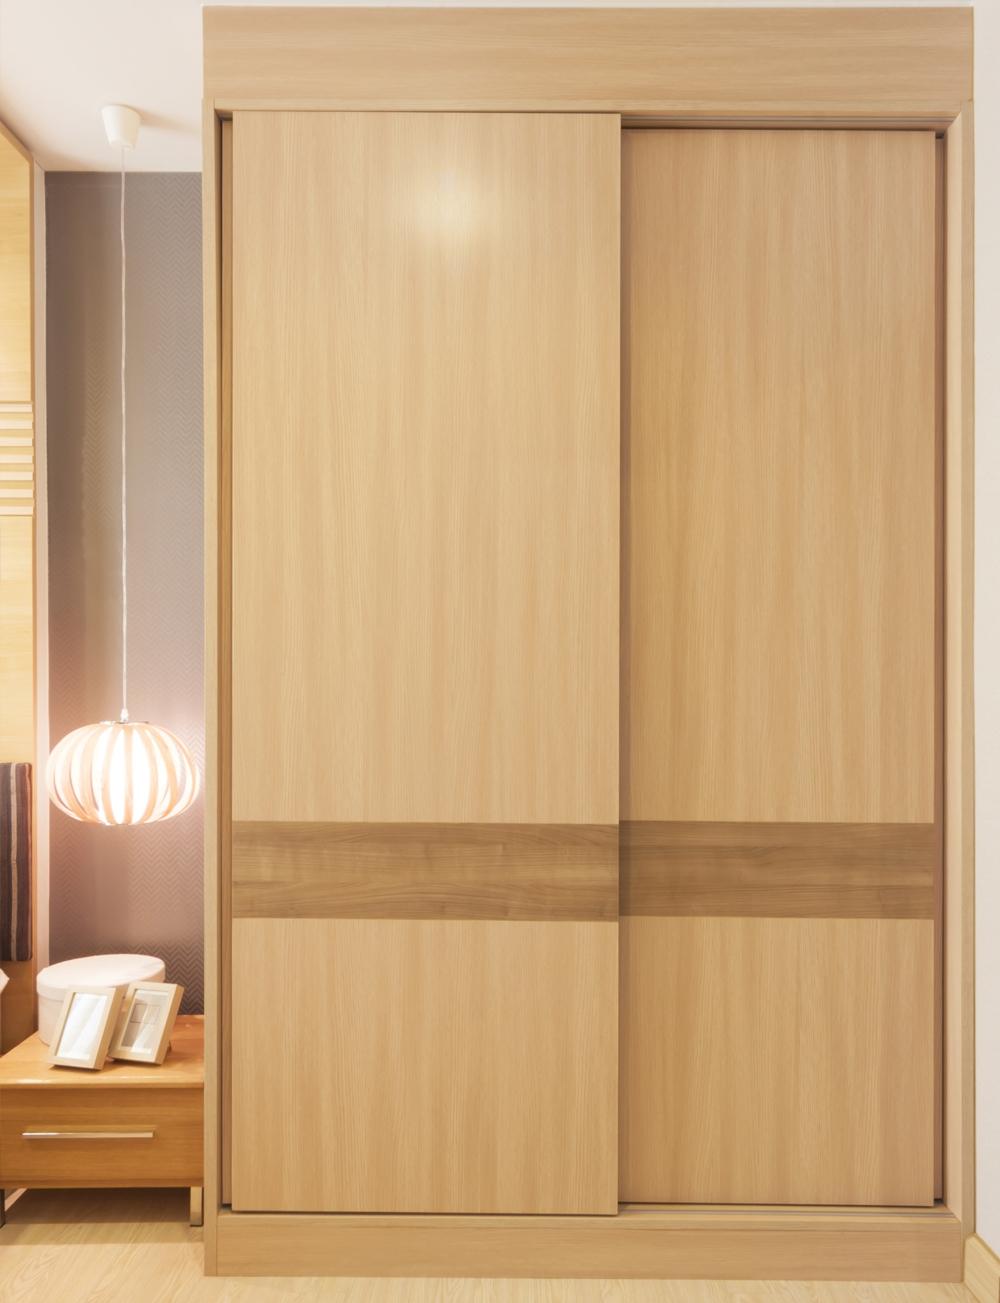 25 Cupboard Sliding Doors Cupboard Ideas